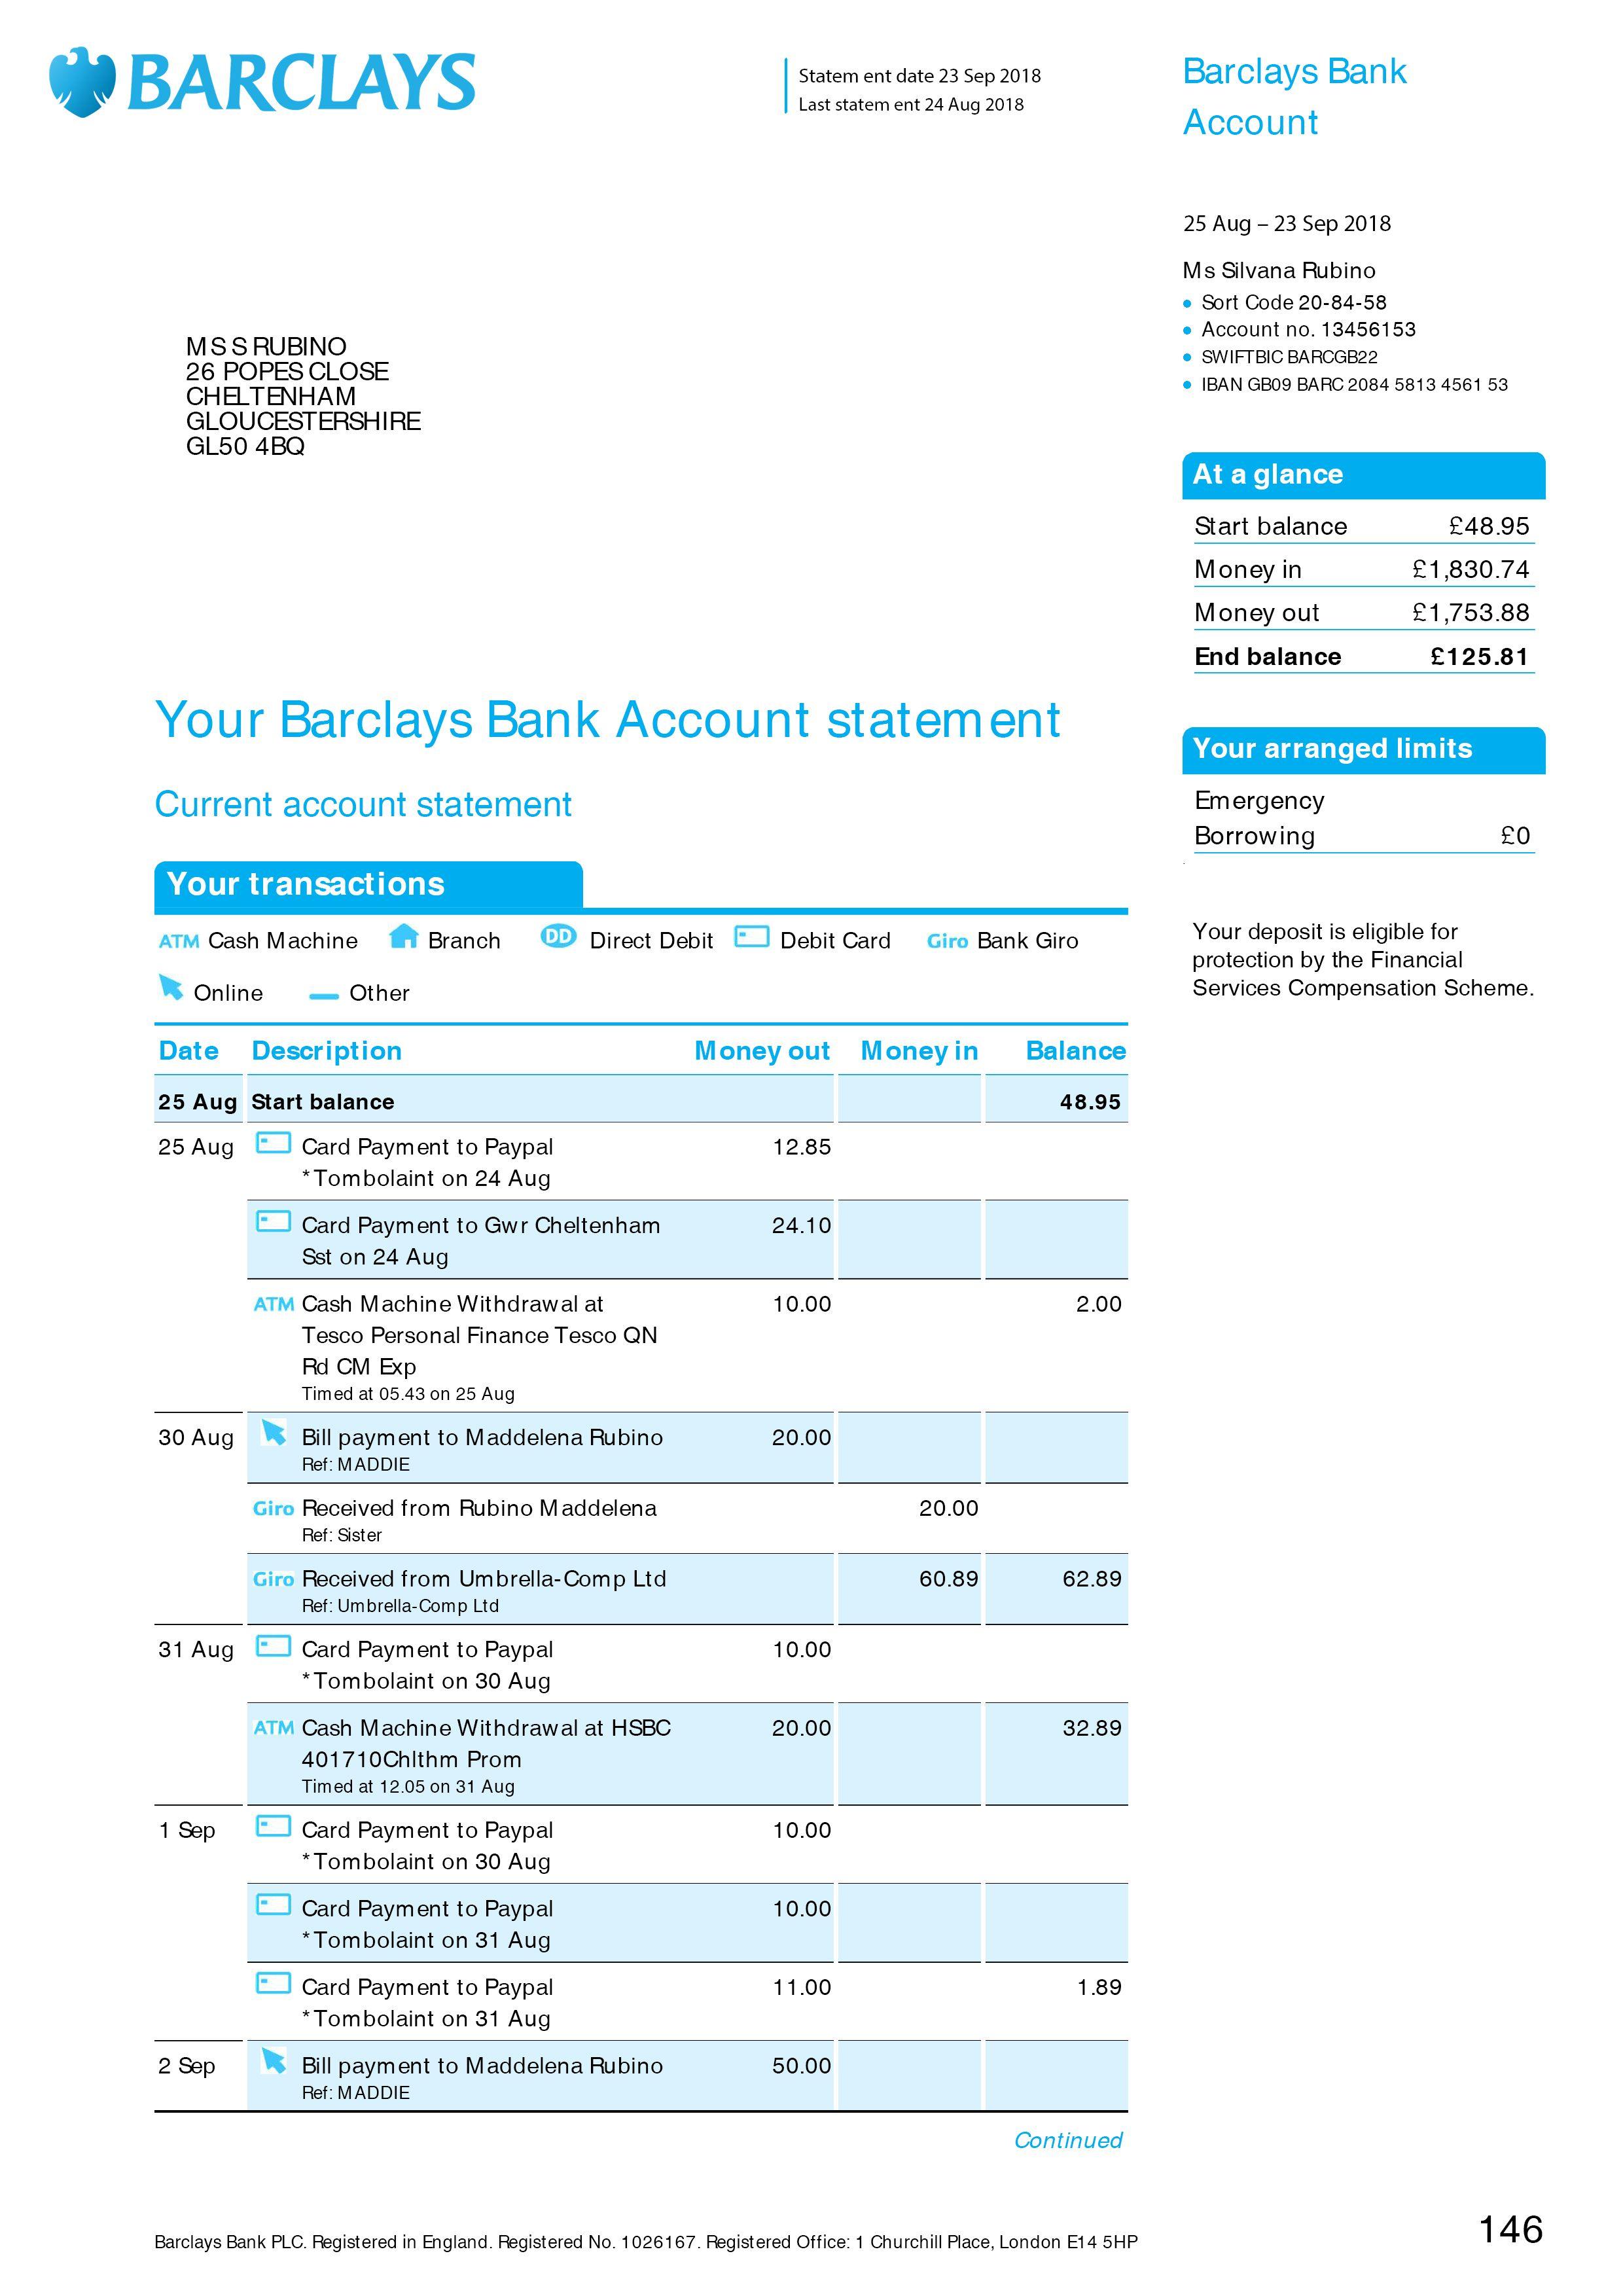 Barclays Bank Statement Psd Template Bank Statement Statement Template Credit Card Statement